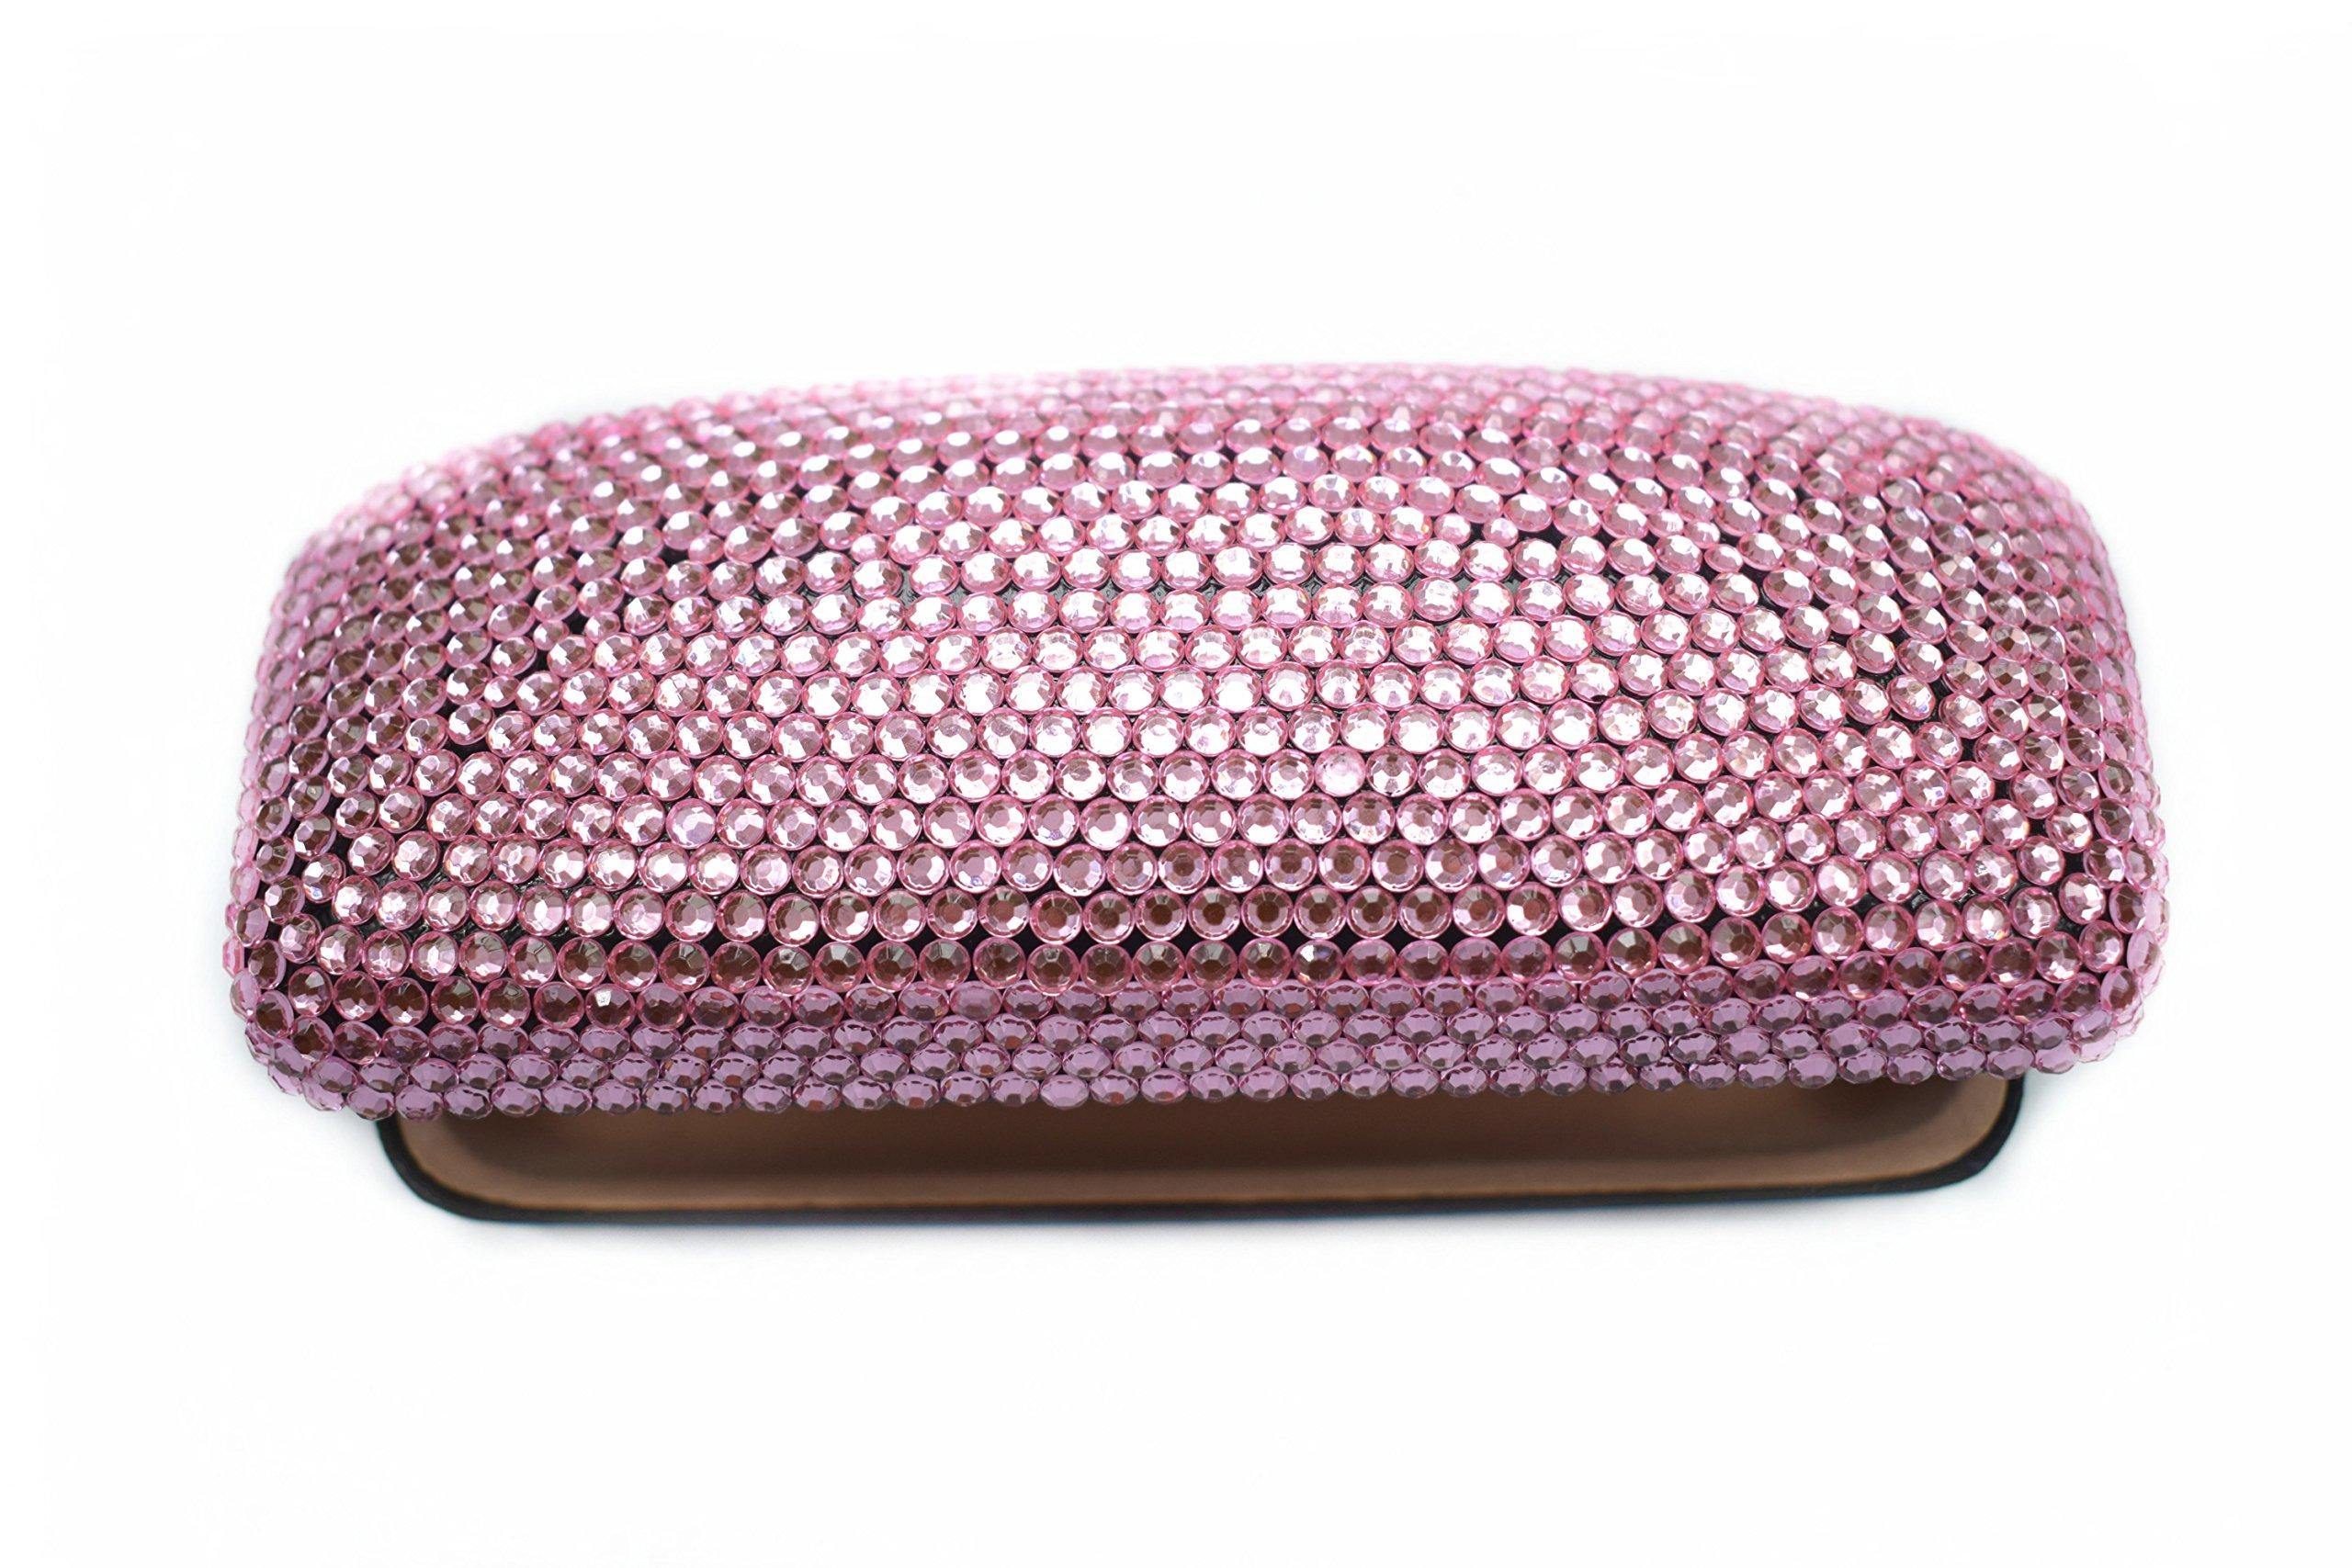 Fashion Pink Bling Crystal Travel Glasses Case Cute Rhinestone Gift Eyeglasses Box by Bling Dynasty (Image #3)